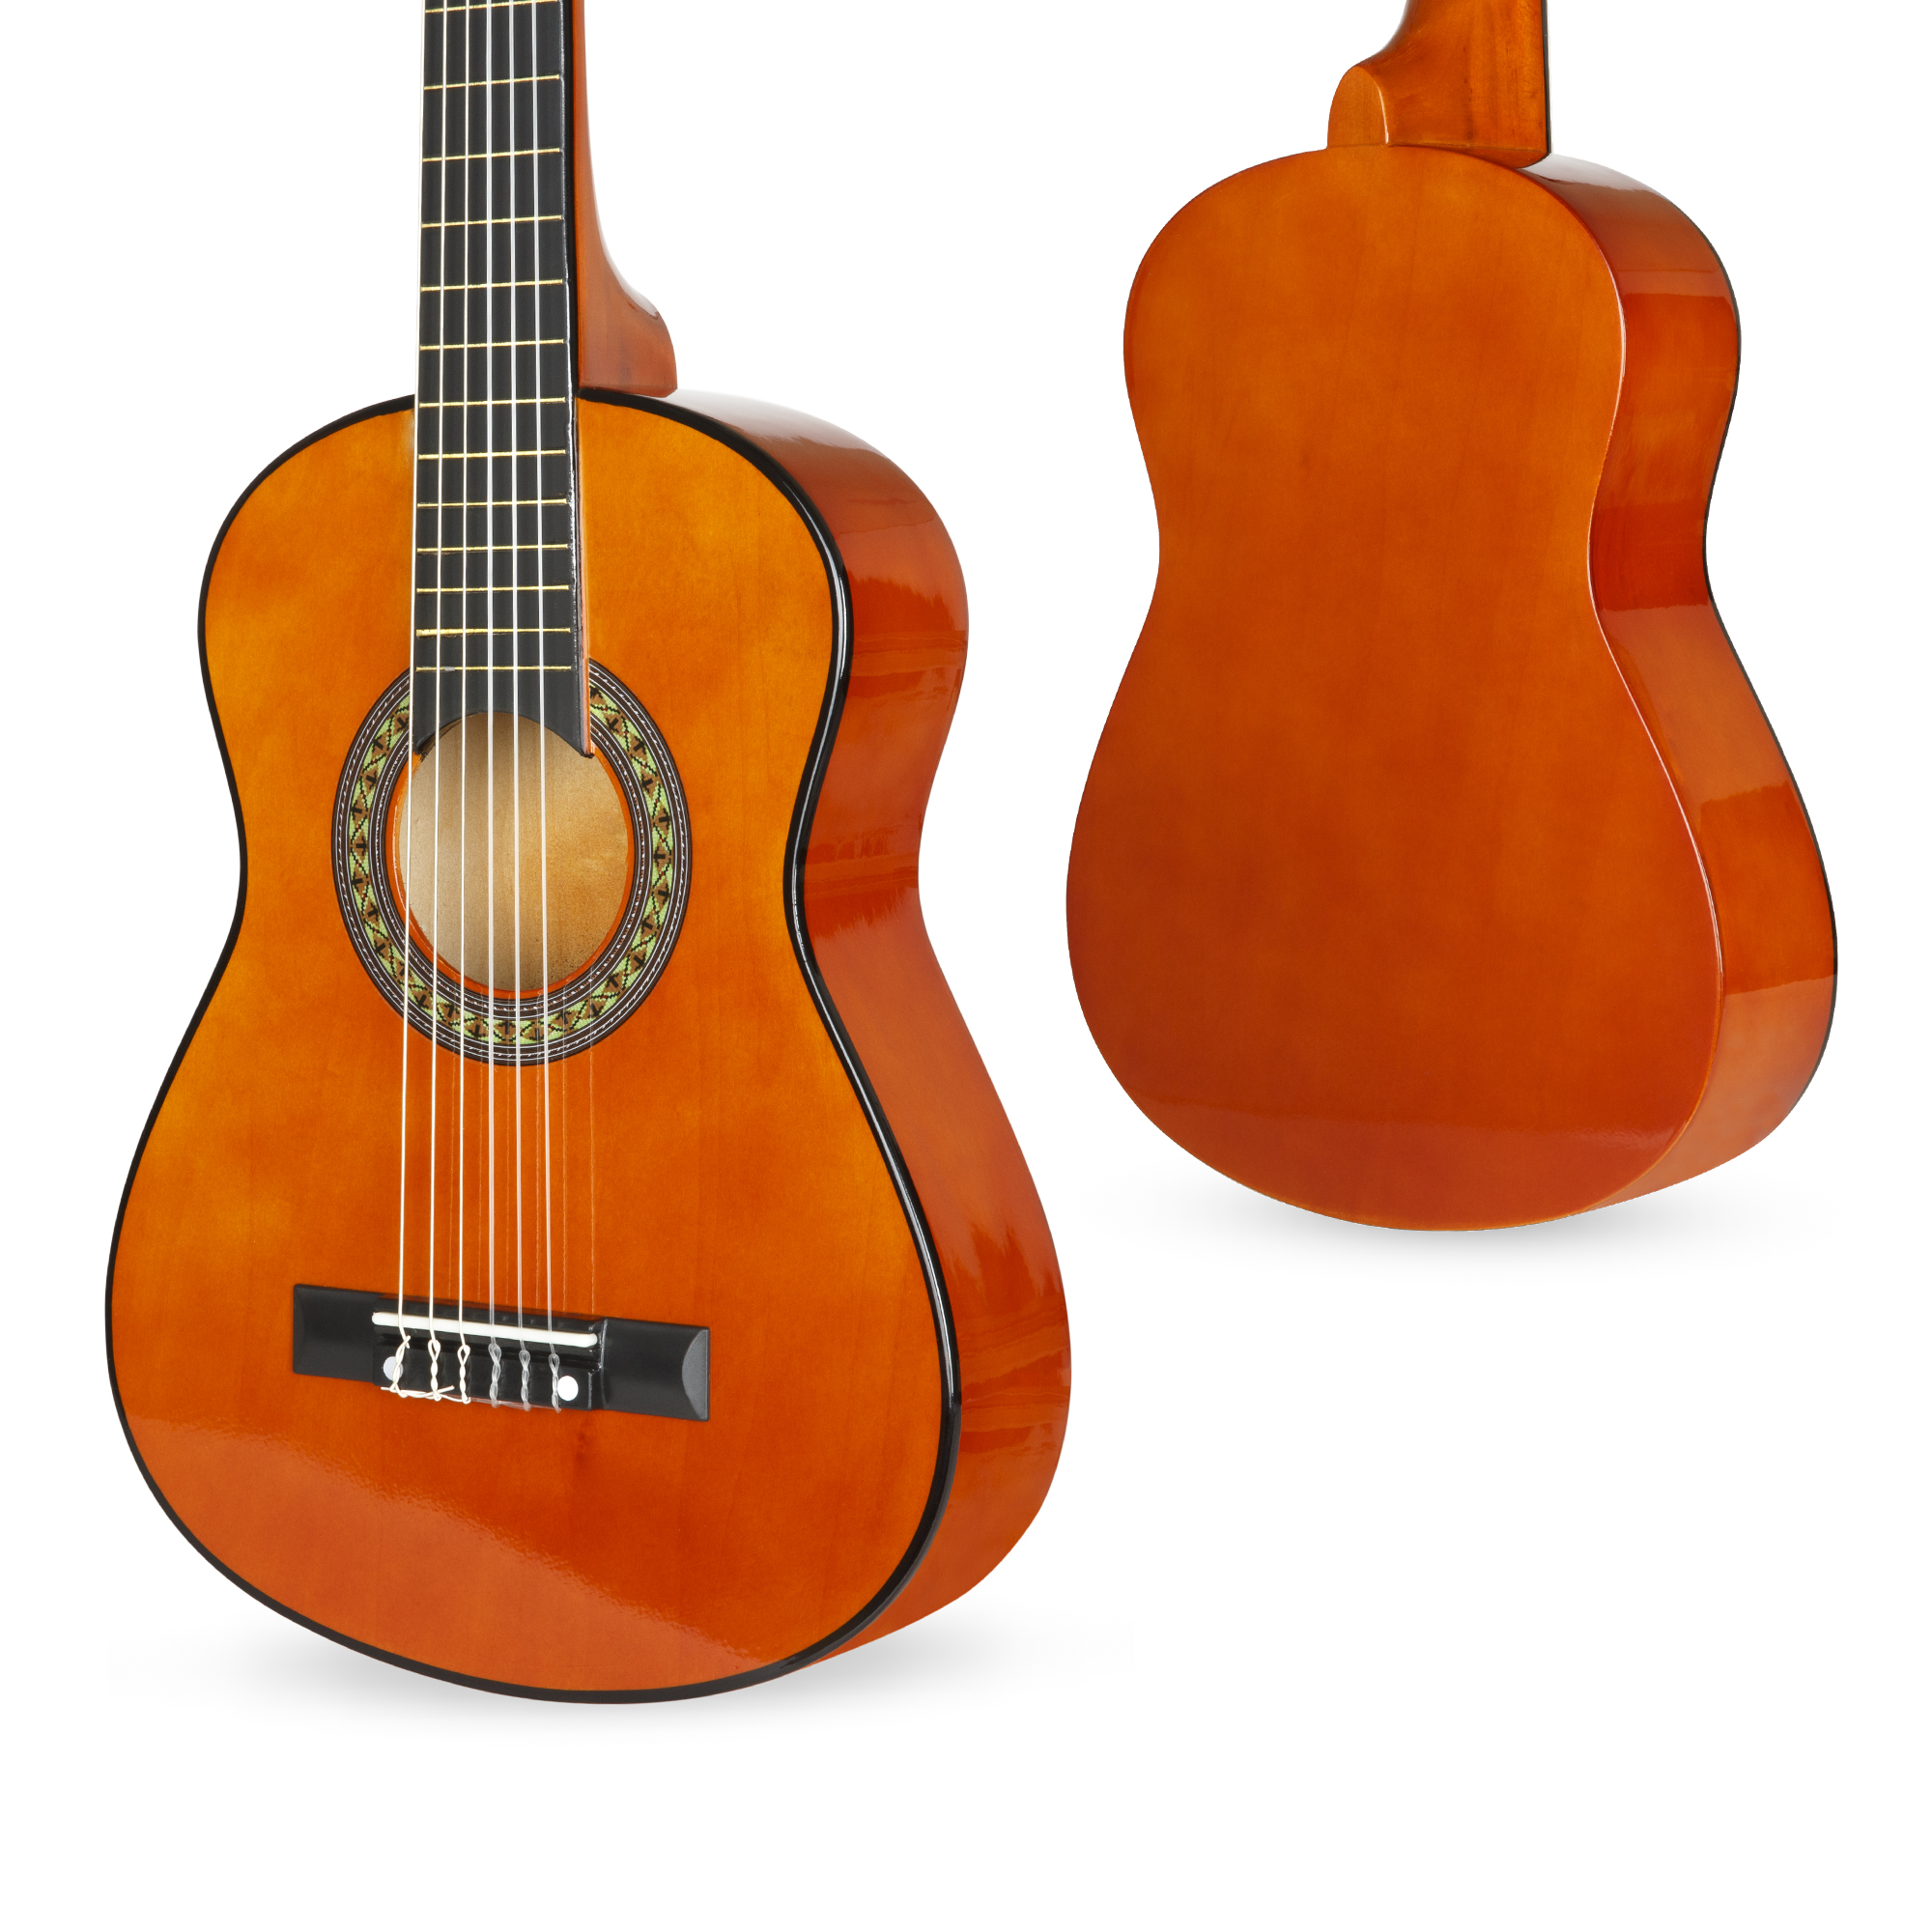 bcp 30in kids classical acoustic guitar beginners set w bag e tuner strap ebay. Black Bedroom Furniture Sets. Home Design Ideas